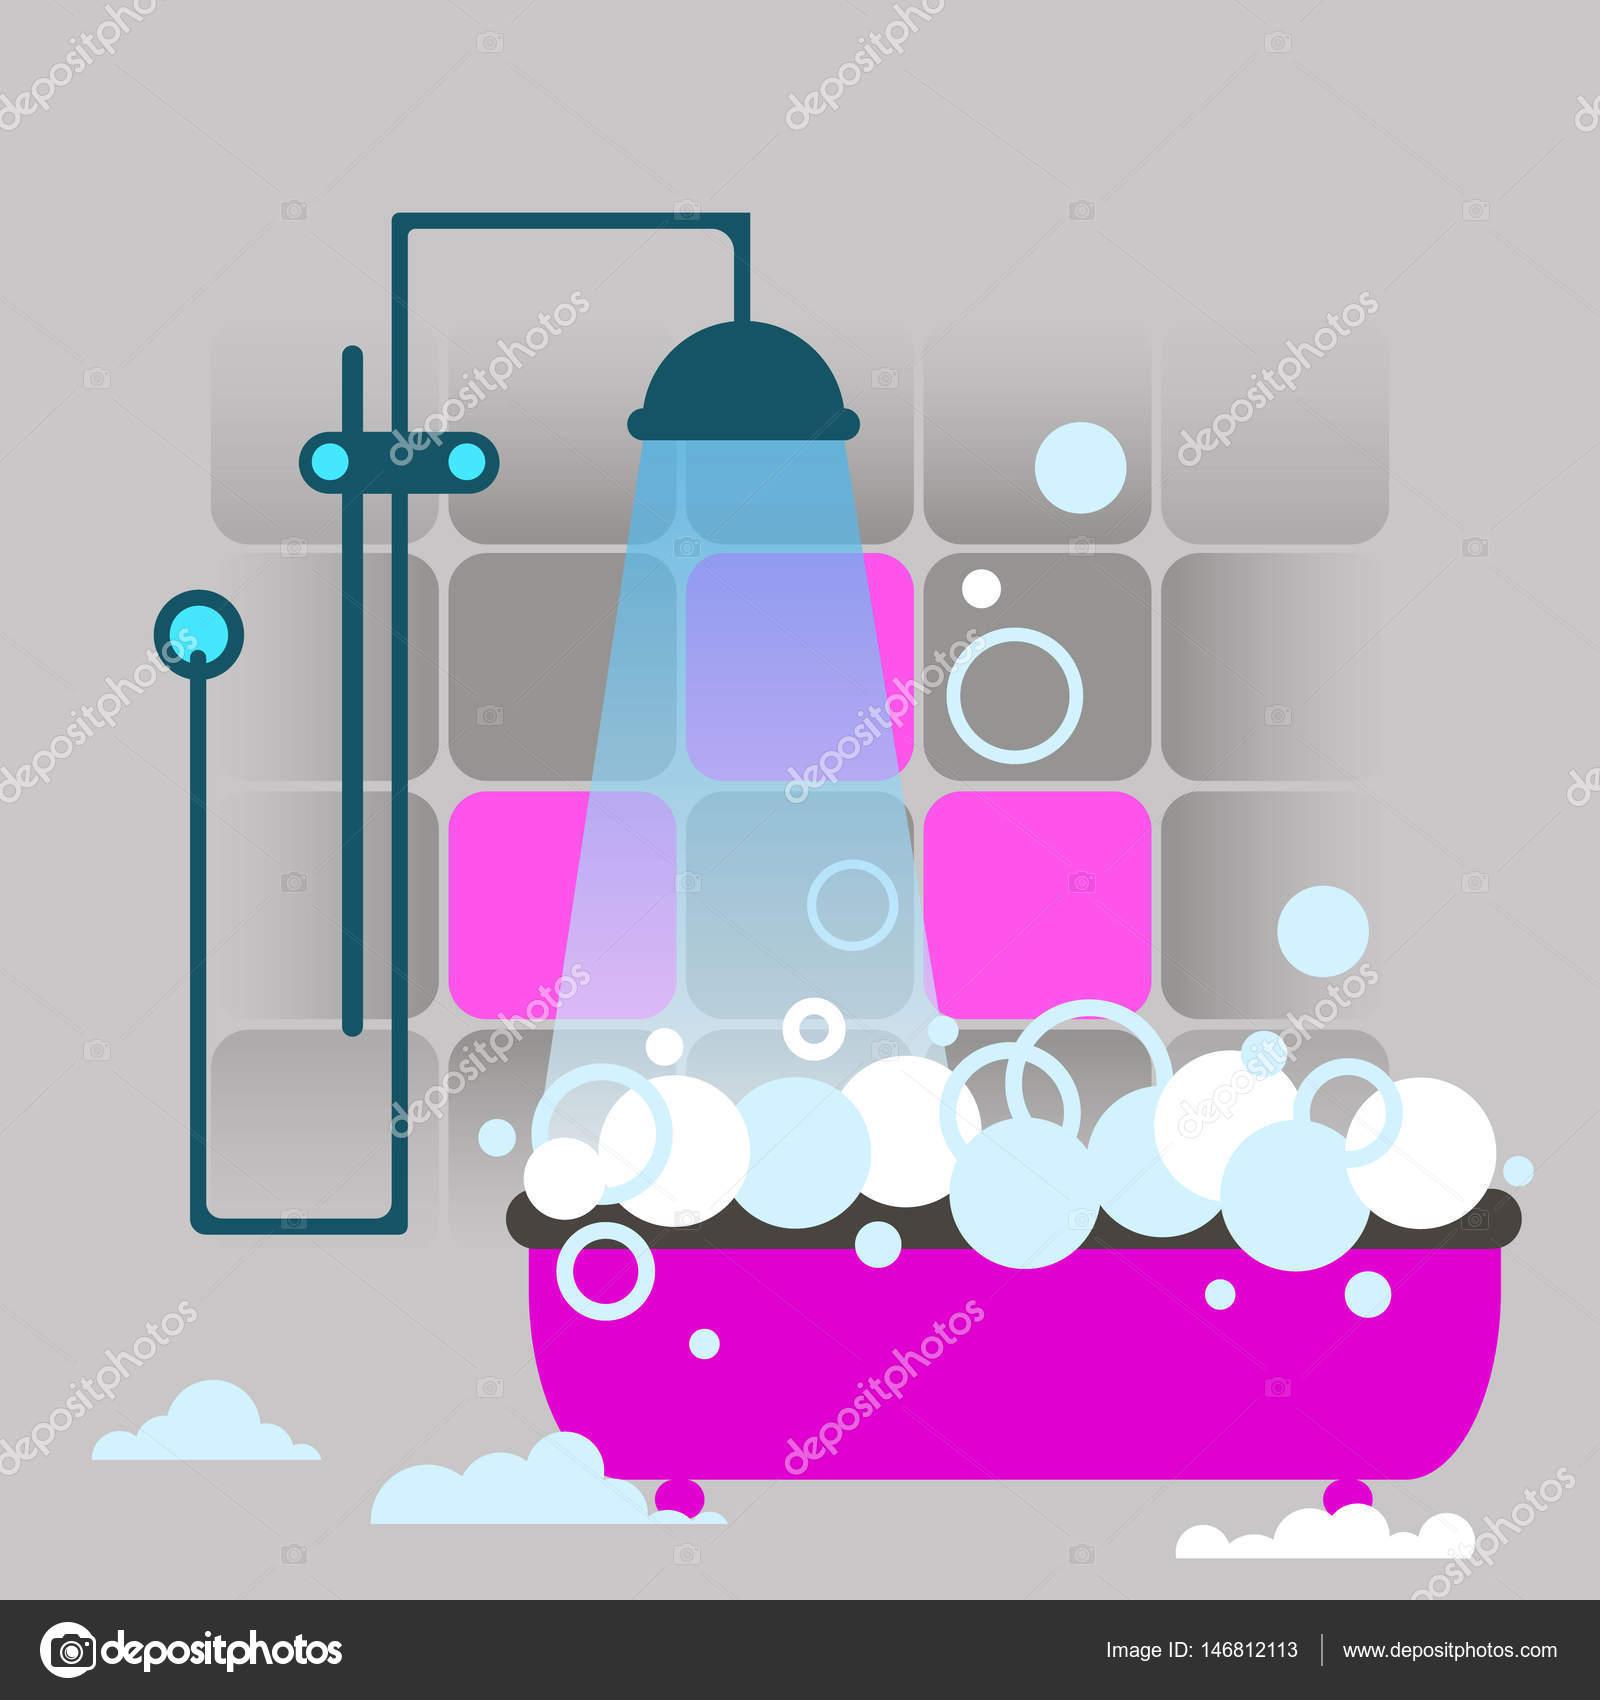 cuarto de baño, vector, interior, pared, ducha, decoración, aseo ...